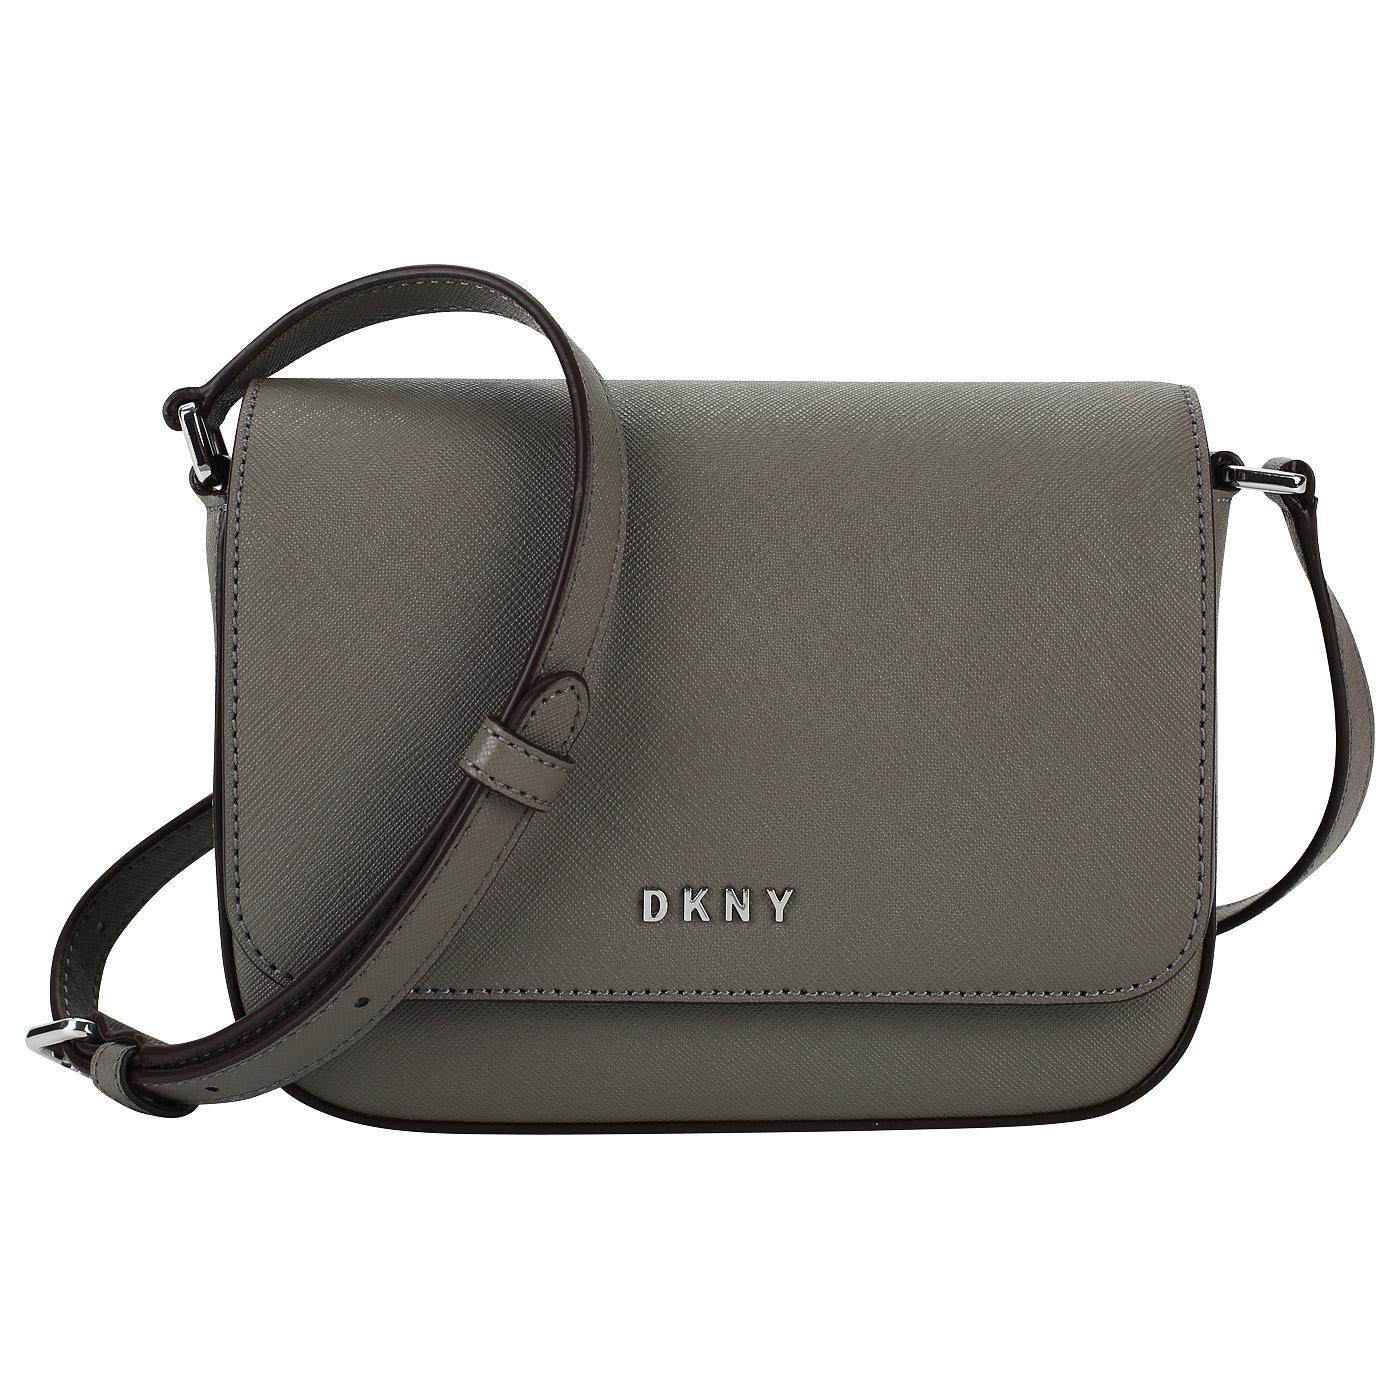 c6802224464b Маленькая сафьяновая сумочка DKNY Bryant R81E1328-CLY - 2000557905818 серый  натуральная кожа 18 x 13 x 7 Цена 12588 руб. купить в интернет-магазине ...